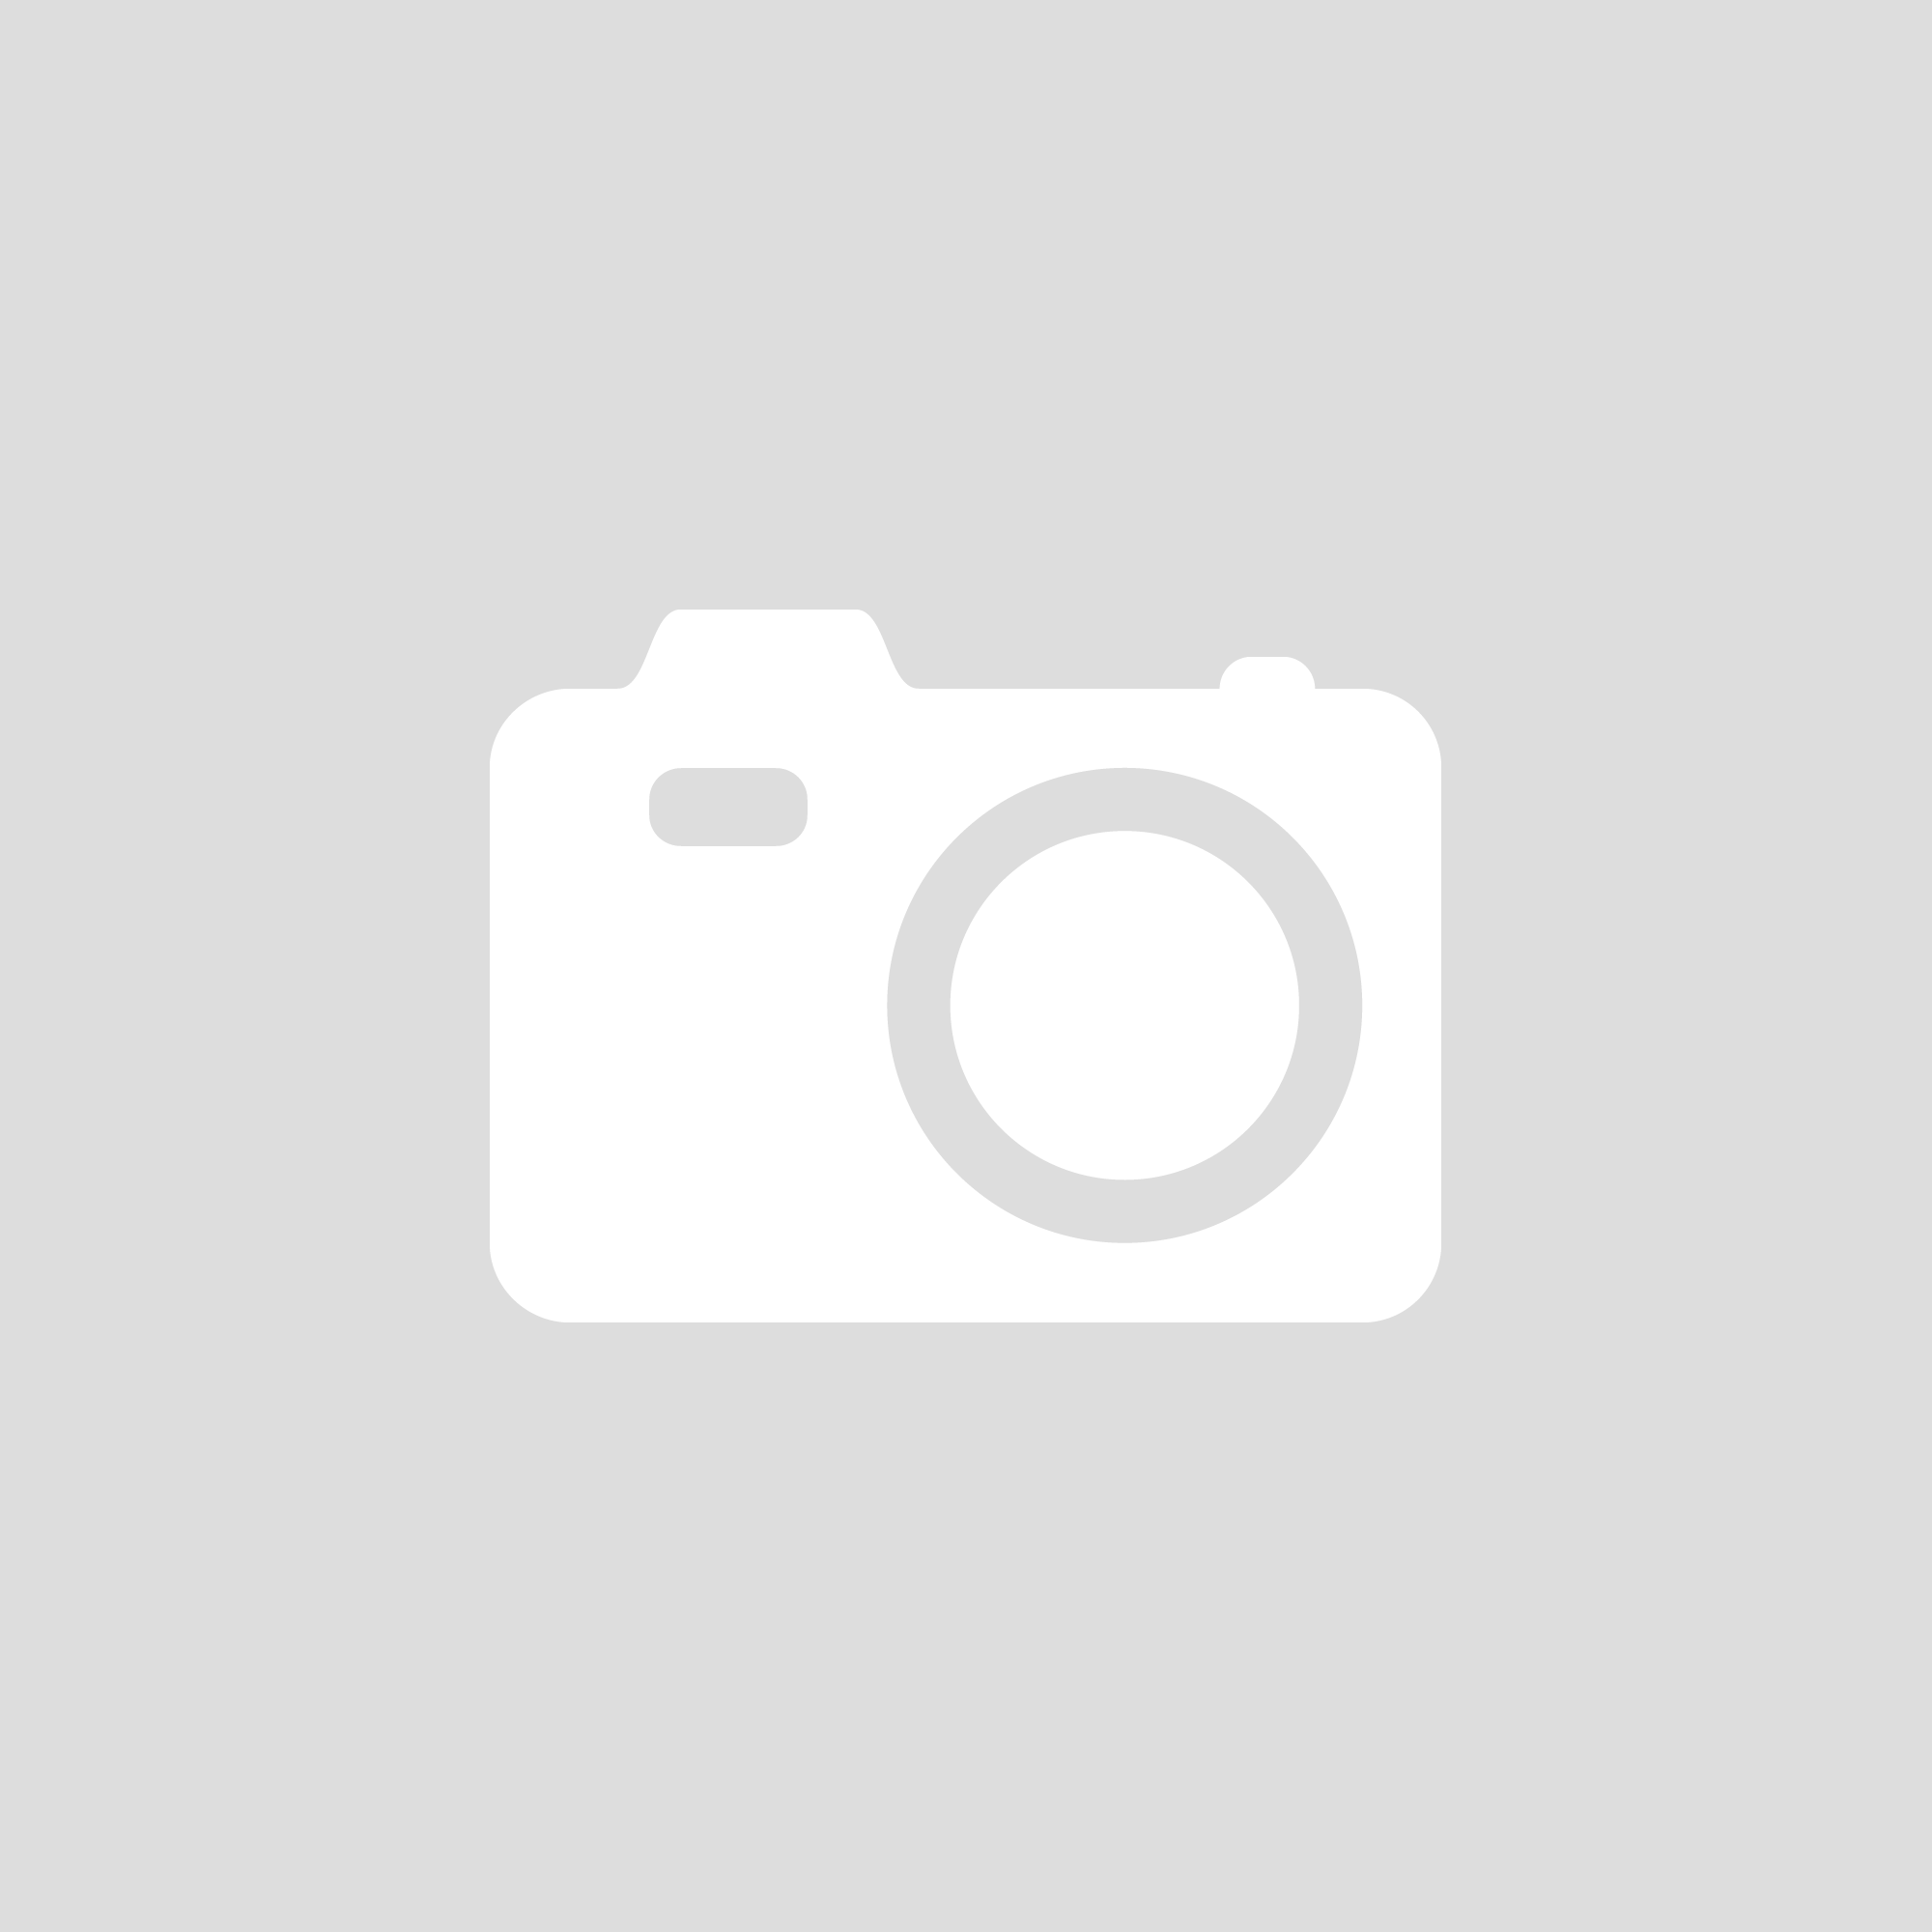 Sensation Lily Wallpaper Lime / Aqua by GranDeco 227224